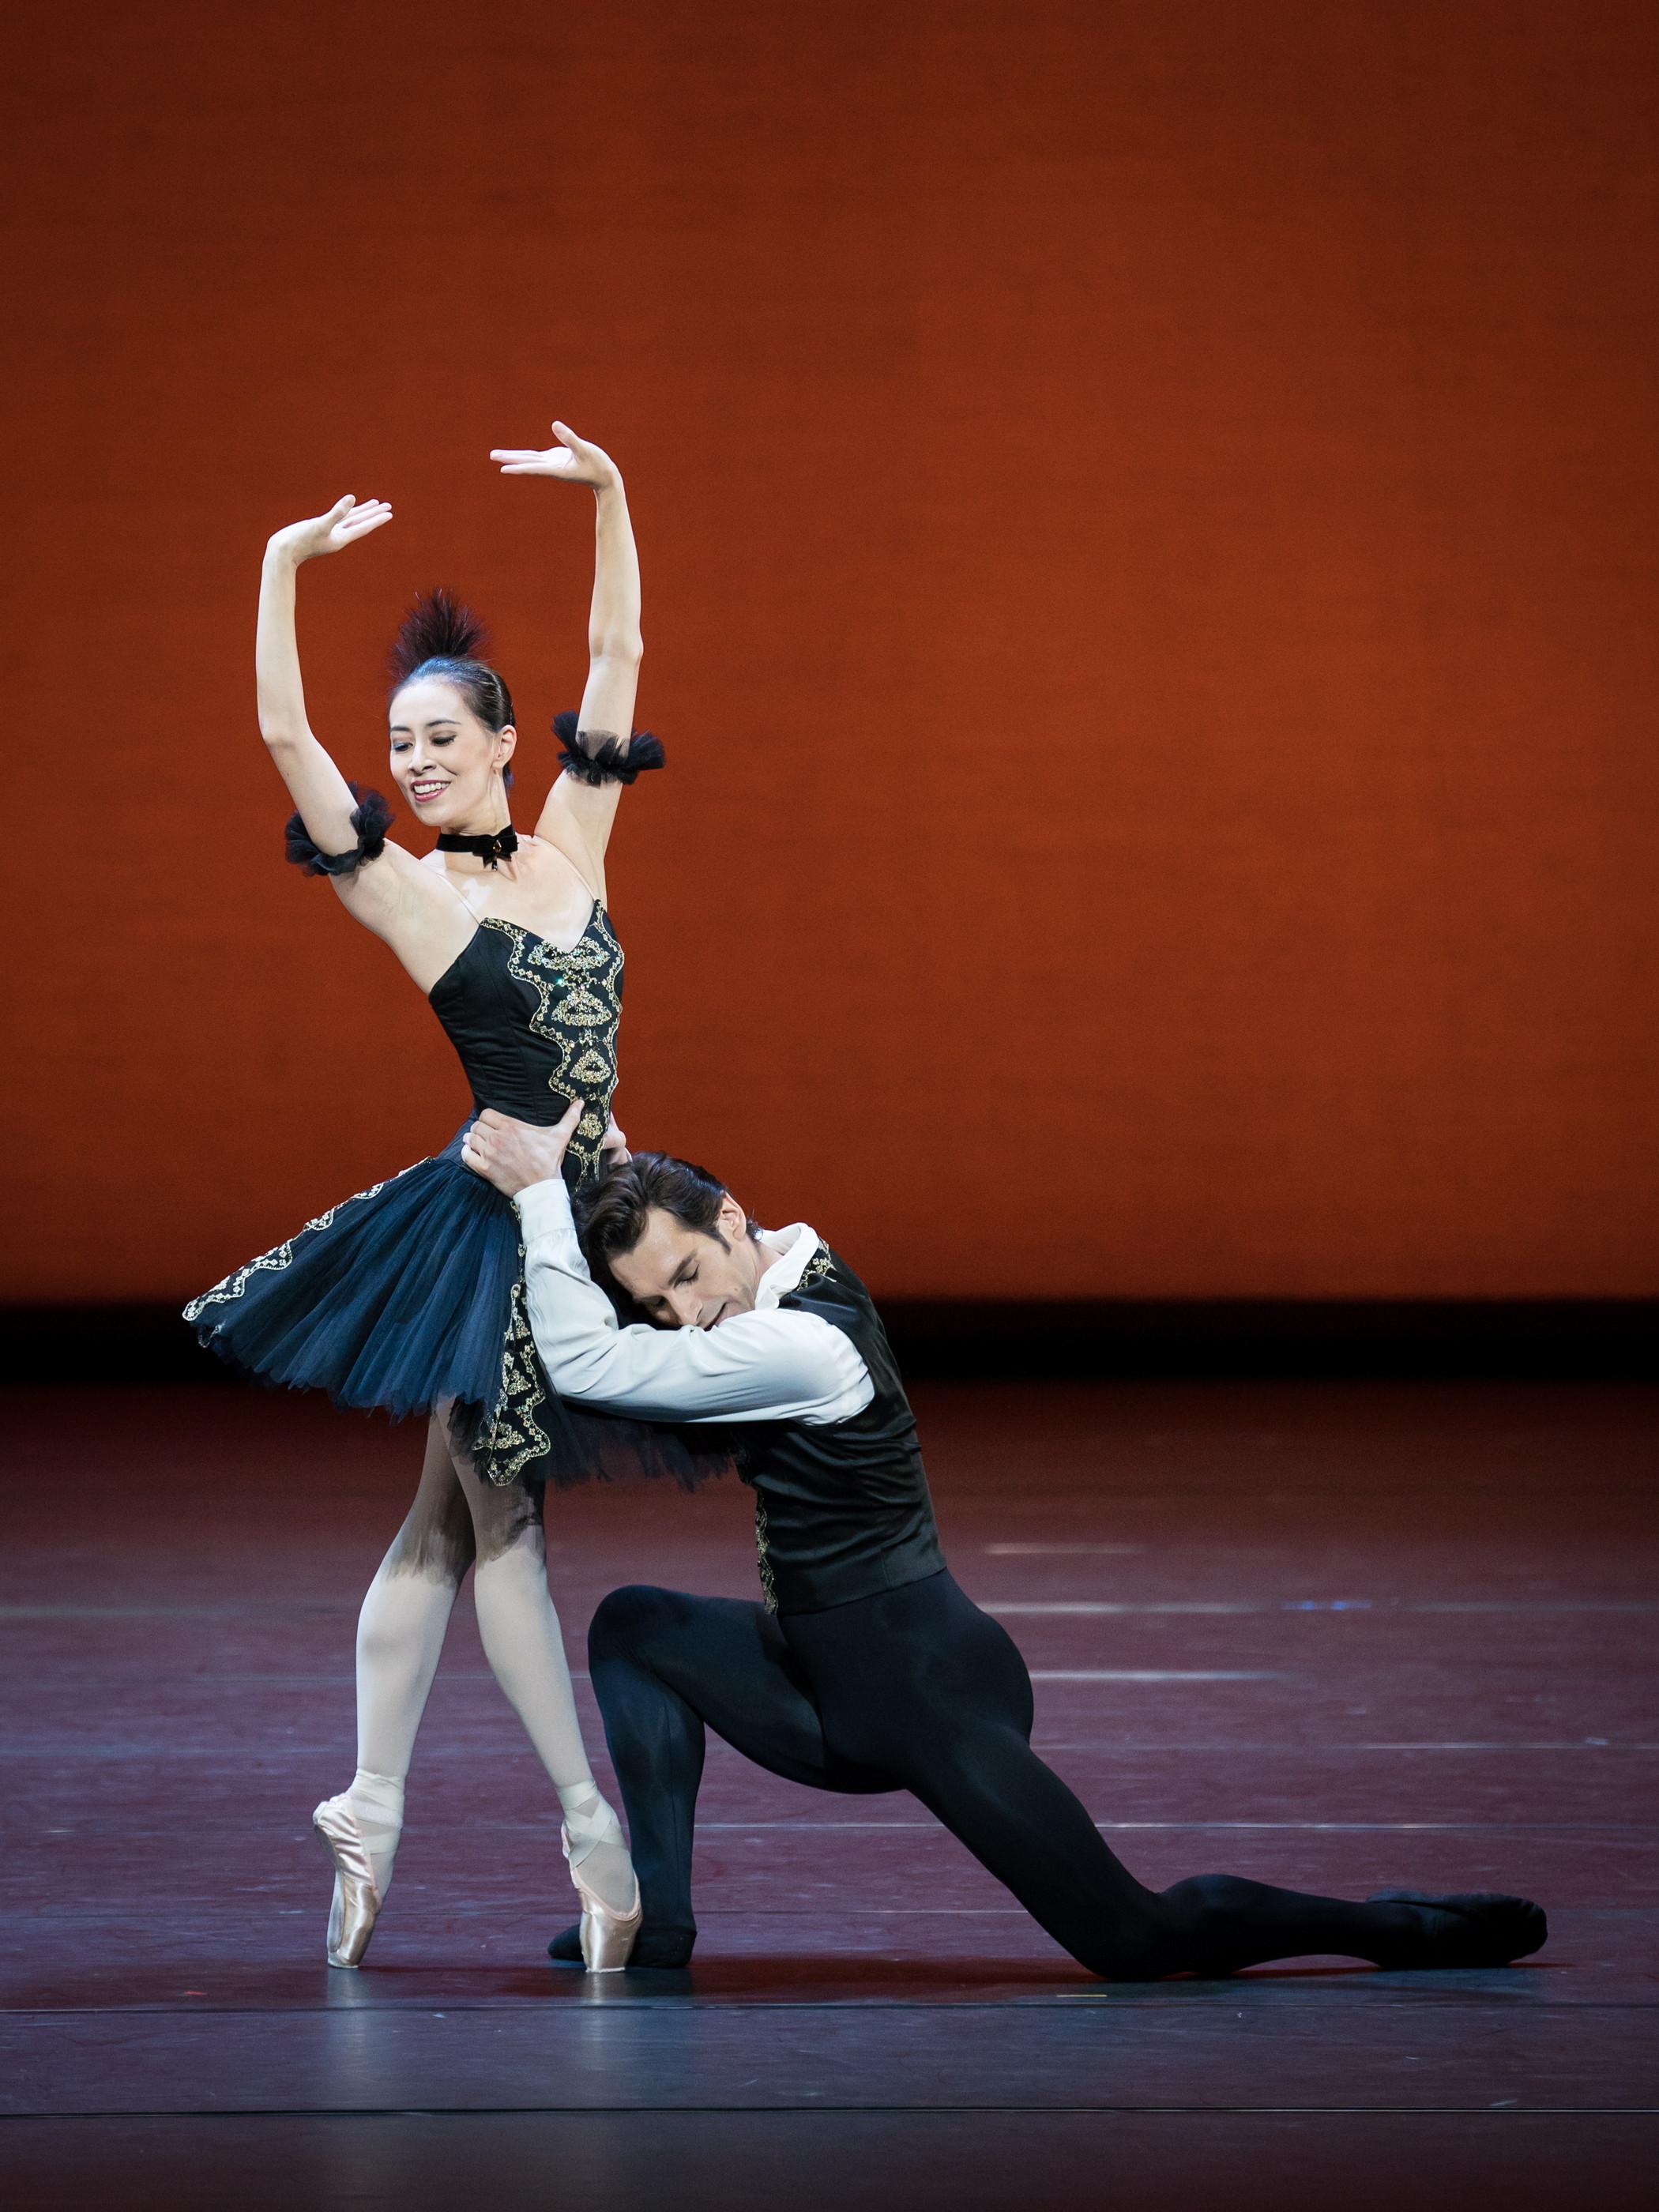 Kyioka Hashimoto and Mihail Sosnovschi. Copyright: Vienna State Ballet/Ashley taylor